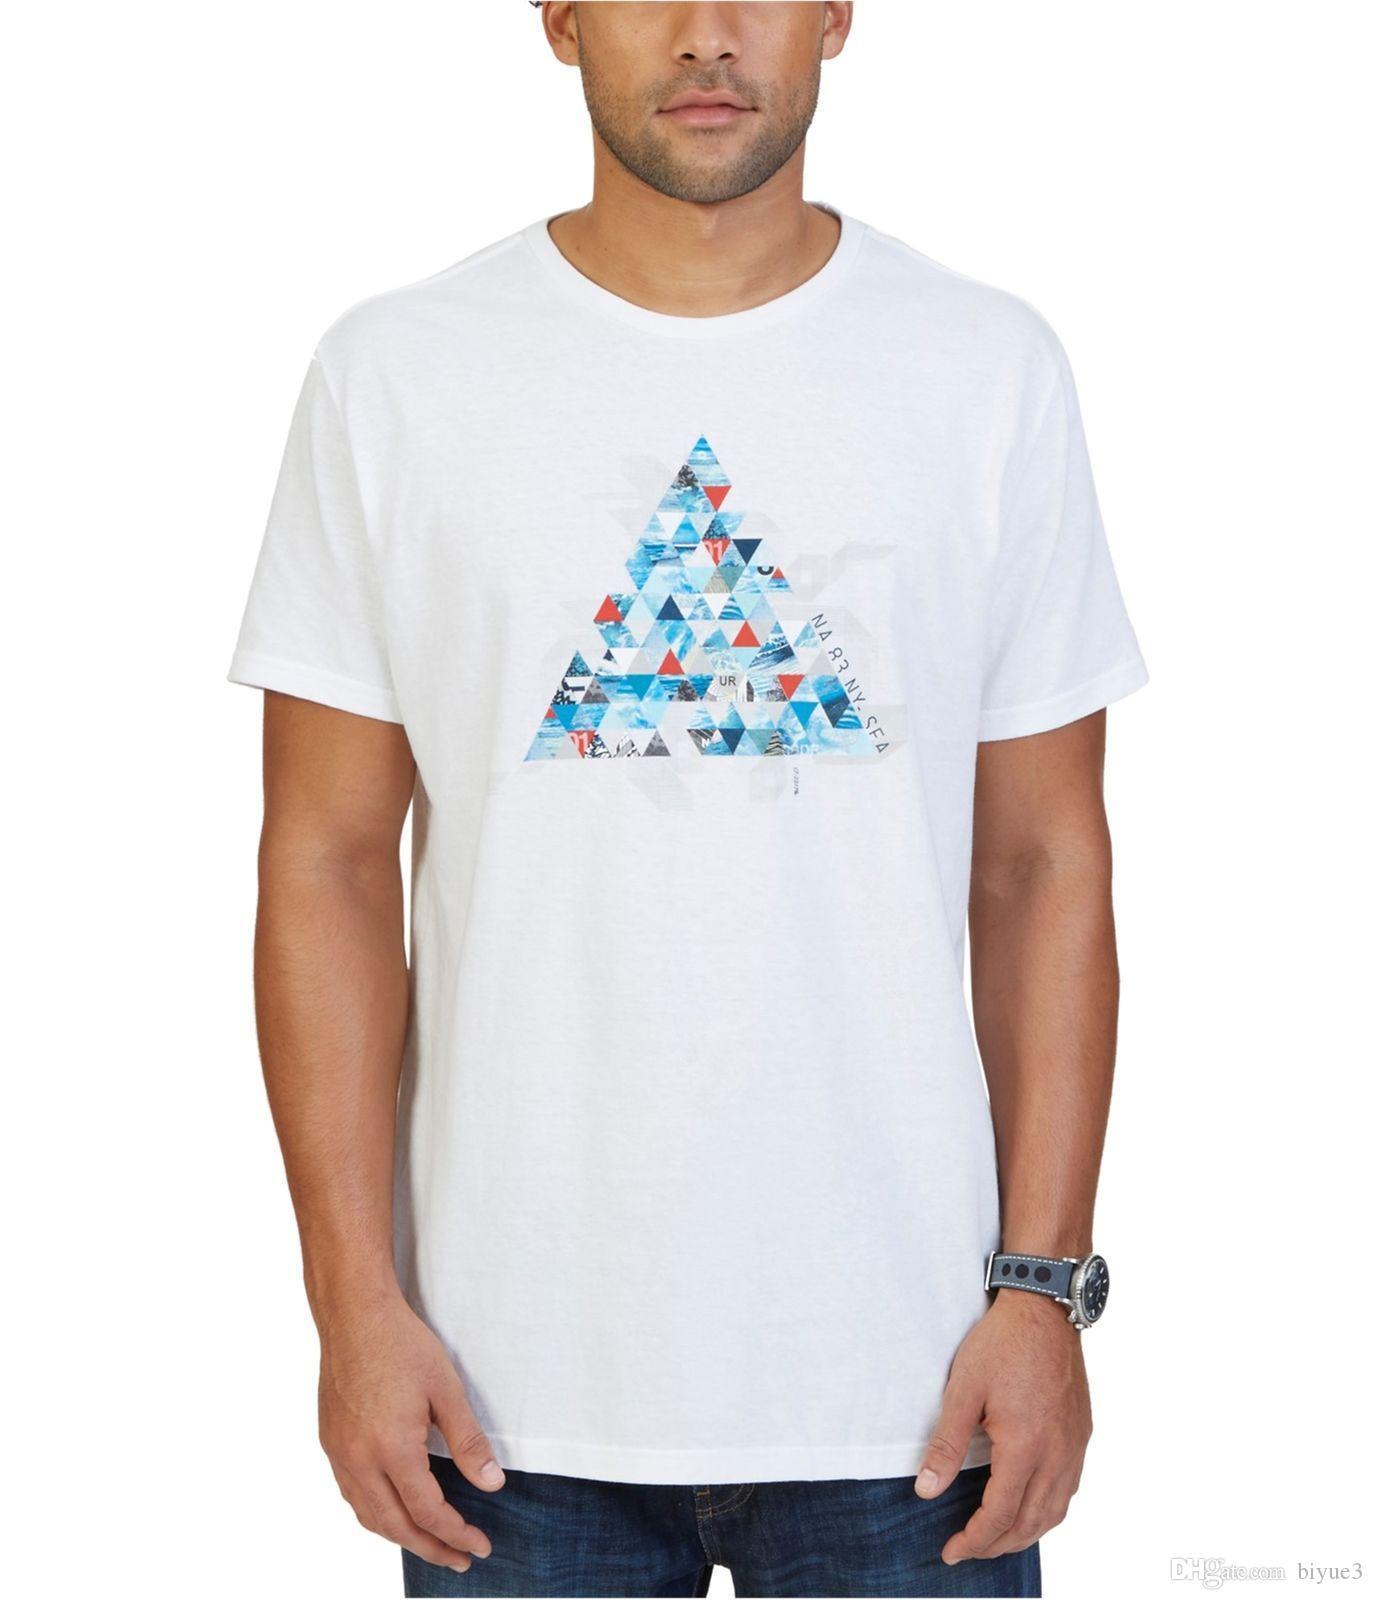 72d64276d05c4 Compre Camiseta Para Hombre Nautica Triangle Pyramid Graphic Brightwht XL A   11.78 Del Biyue3